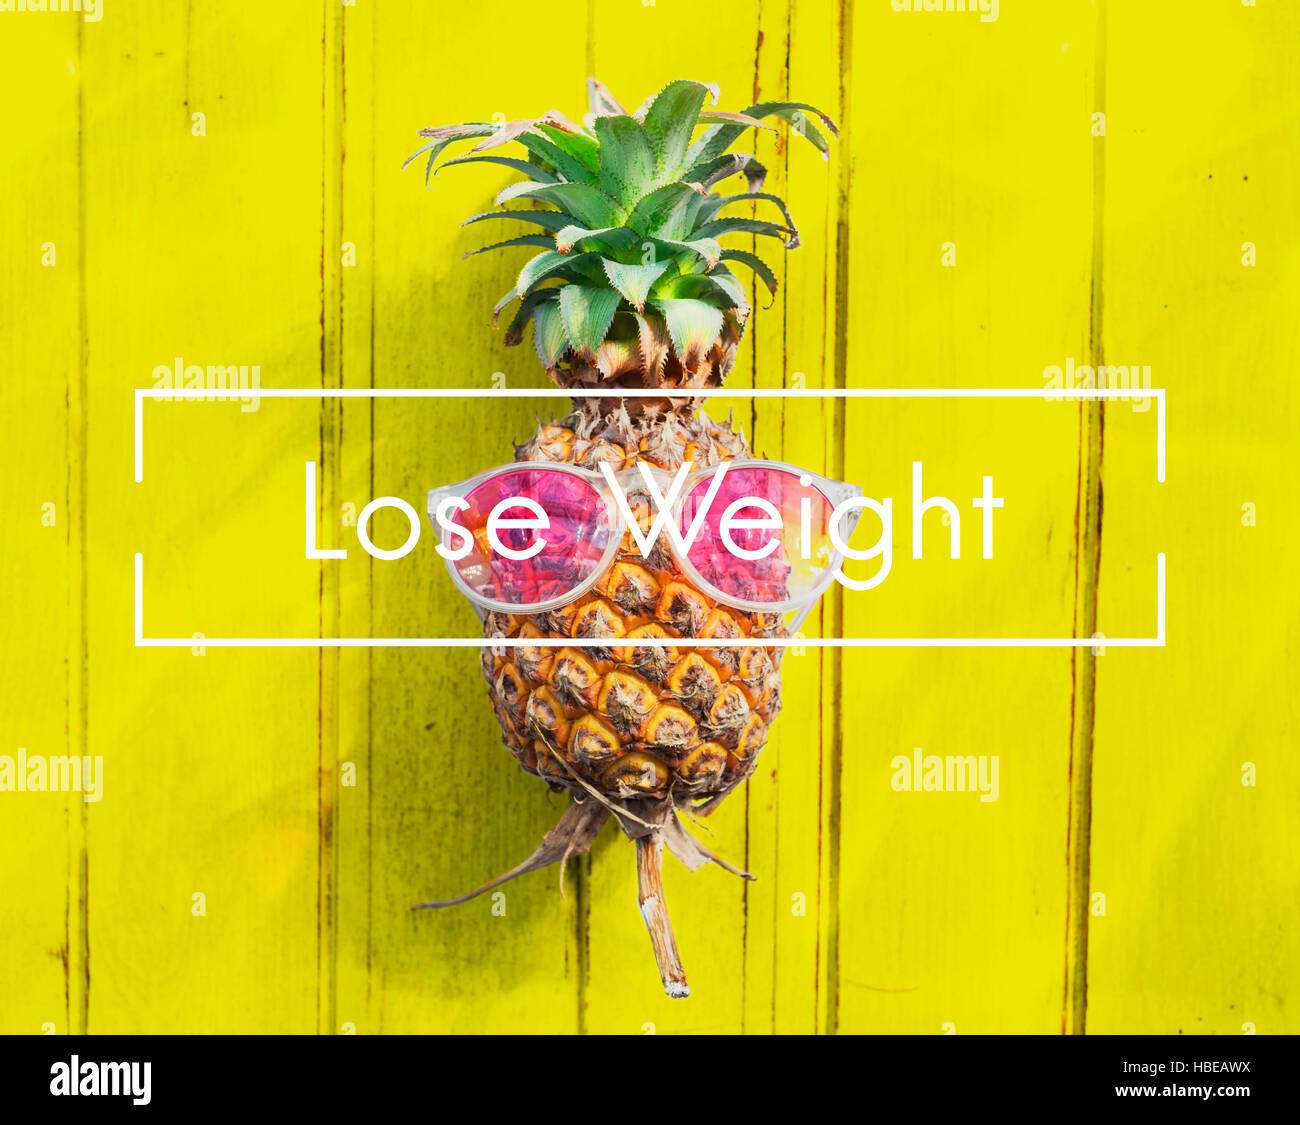 Lose Weight Balance Cardio Fitness Health Slim Concept - Stock Image